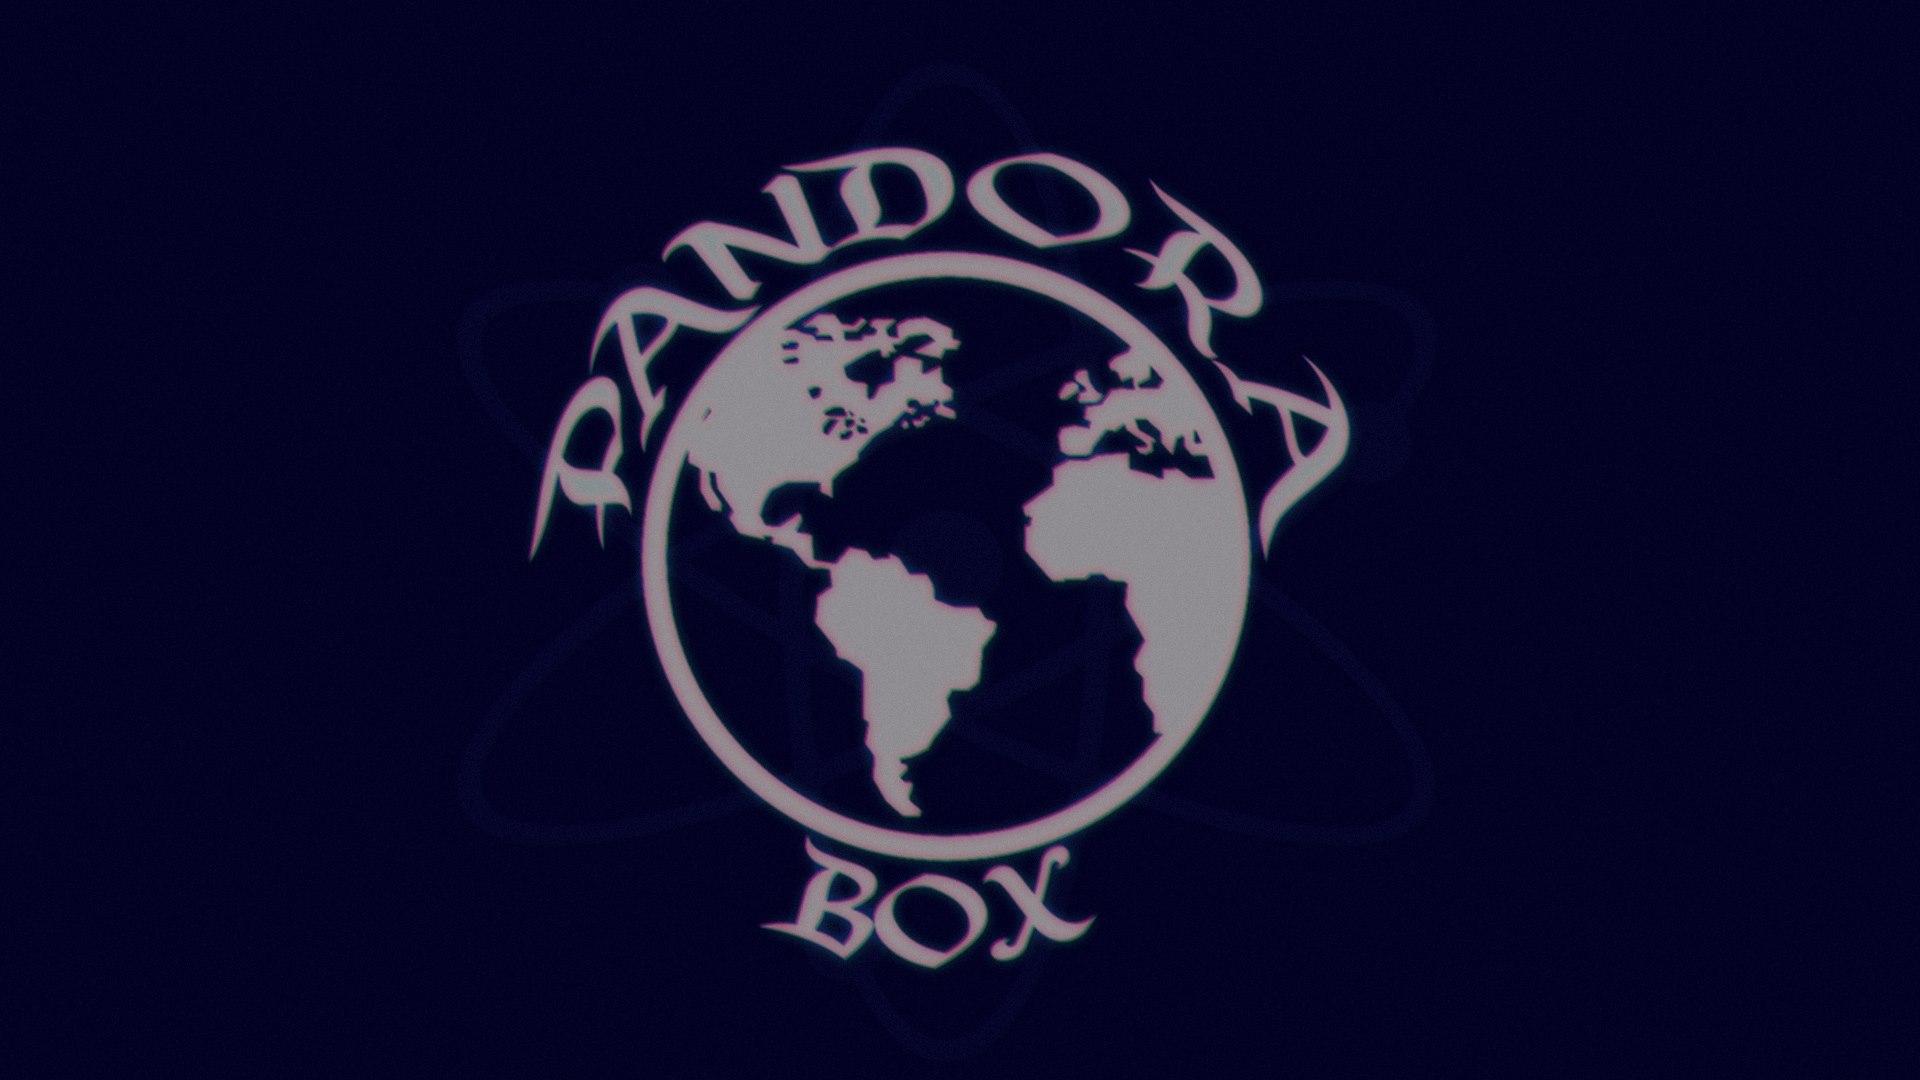 thepandorabox